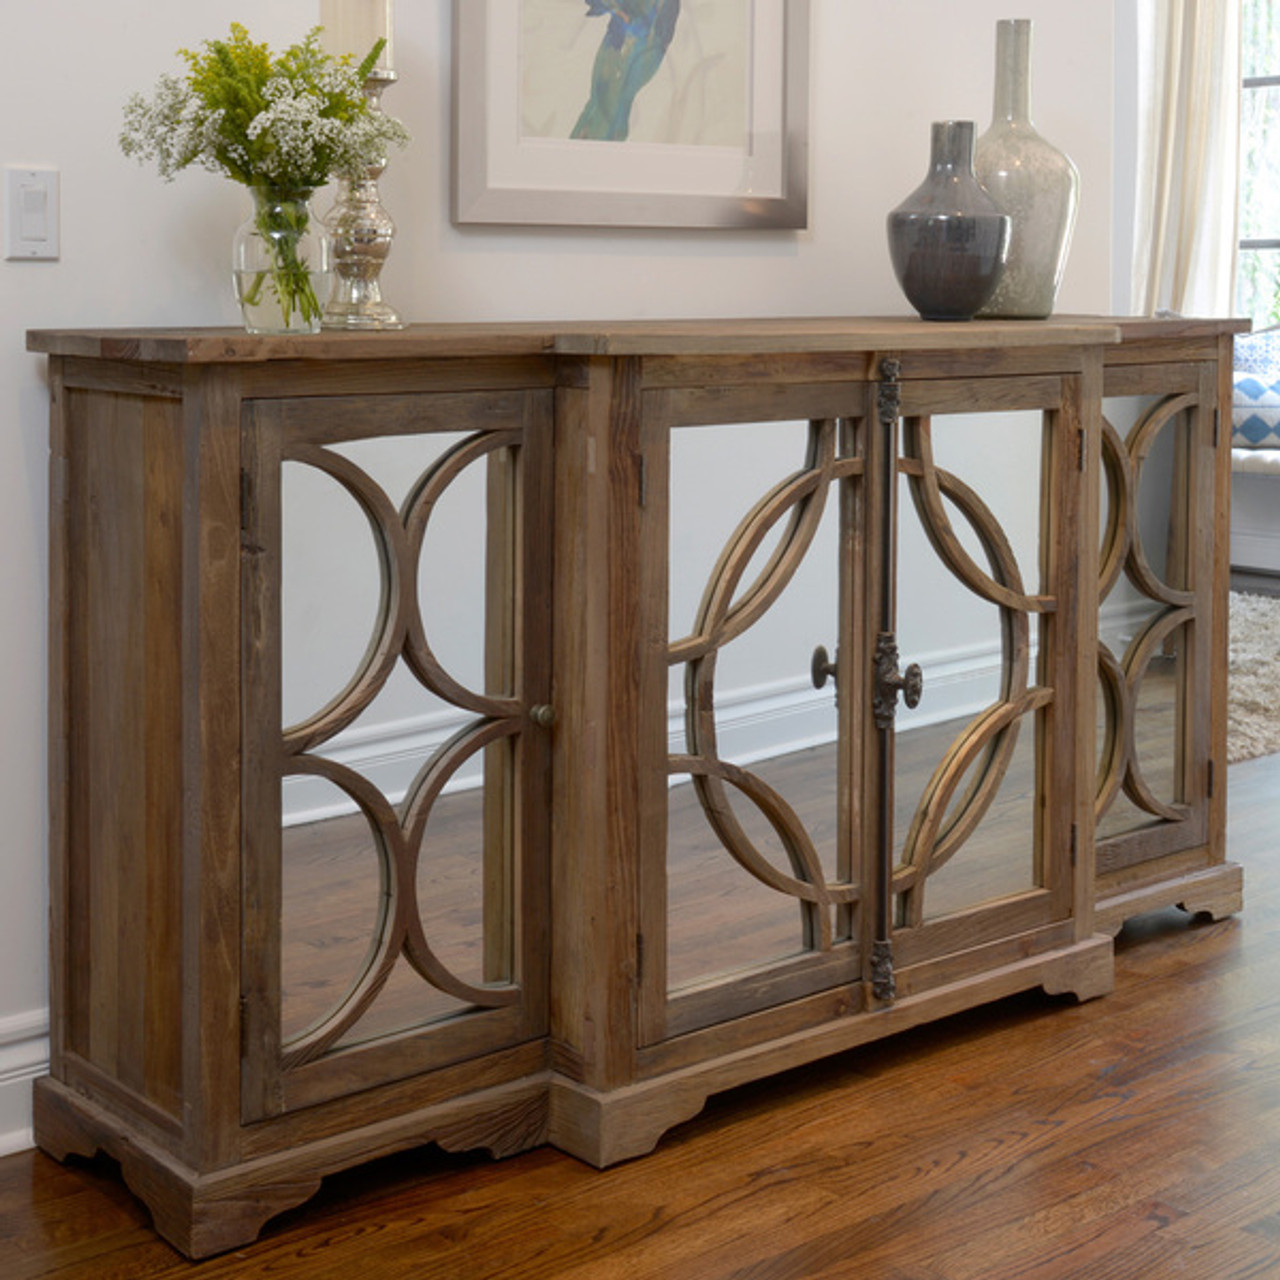 wells reclaimed elm wood mirrored sideboard buffet zin home rh zinhome com Antique Oak Sideboard with Mirror Mirror Sideboard Cabinet